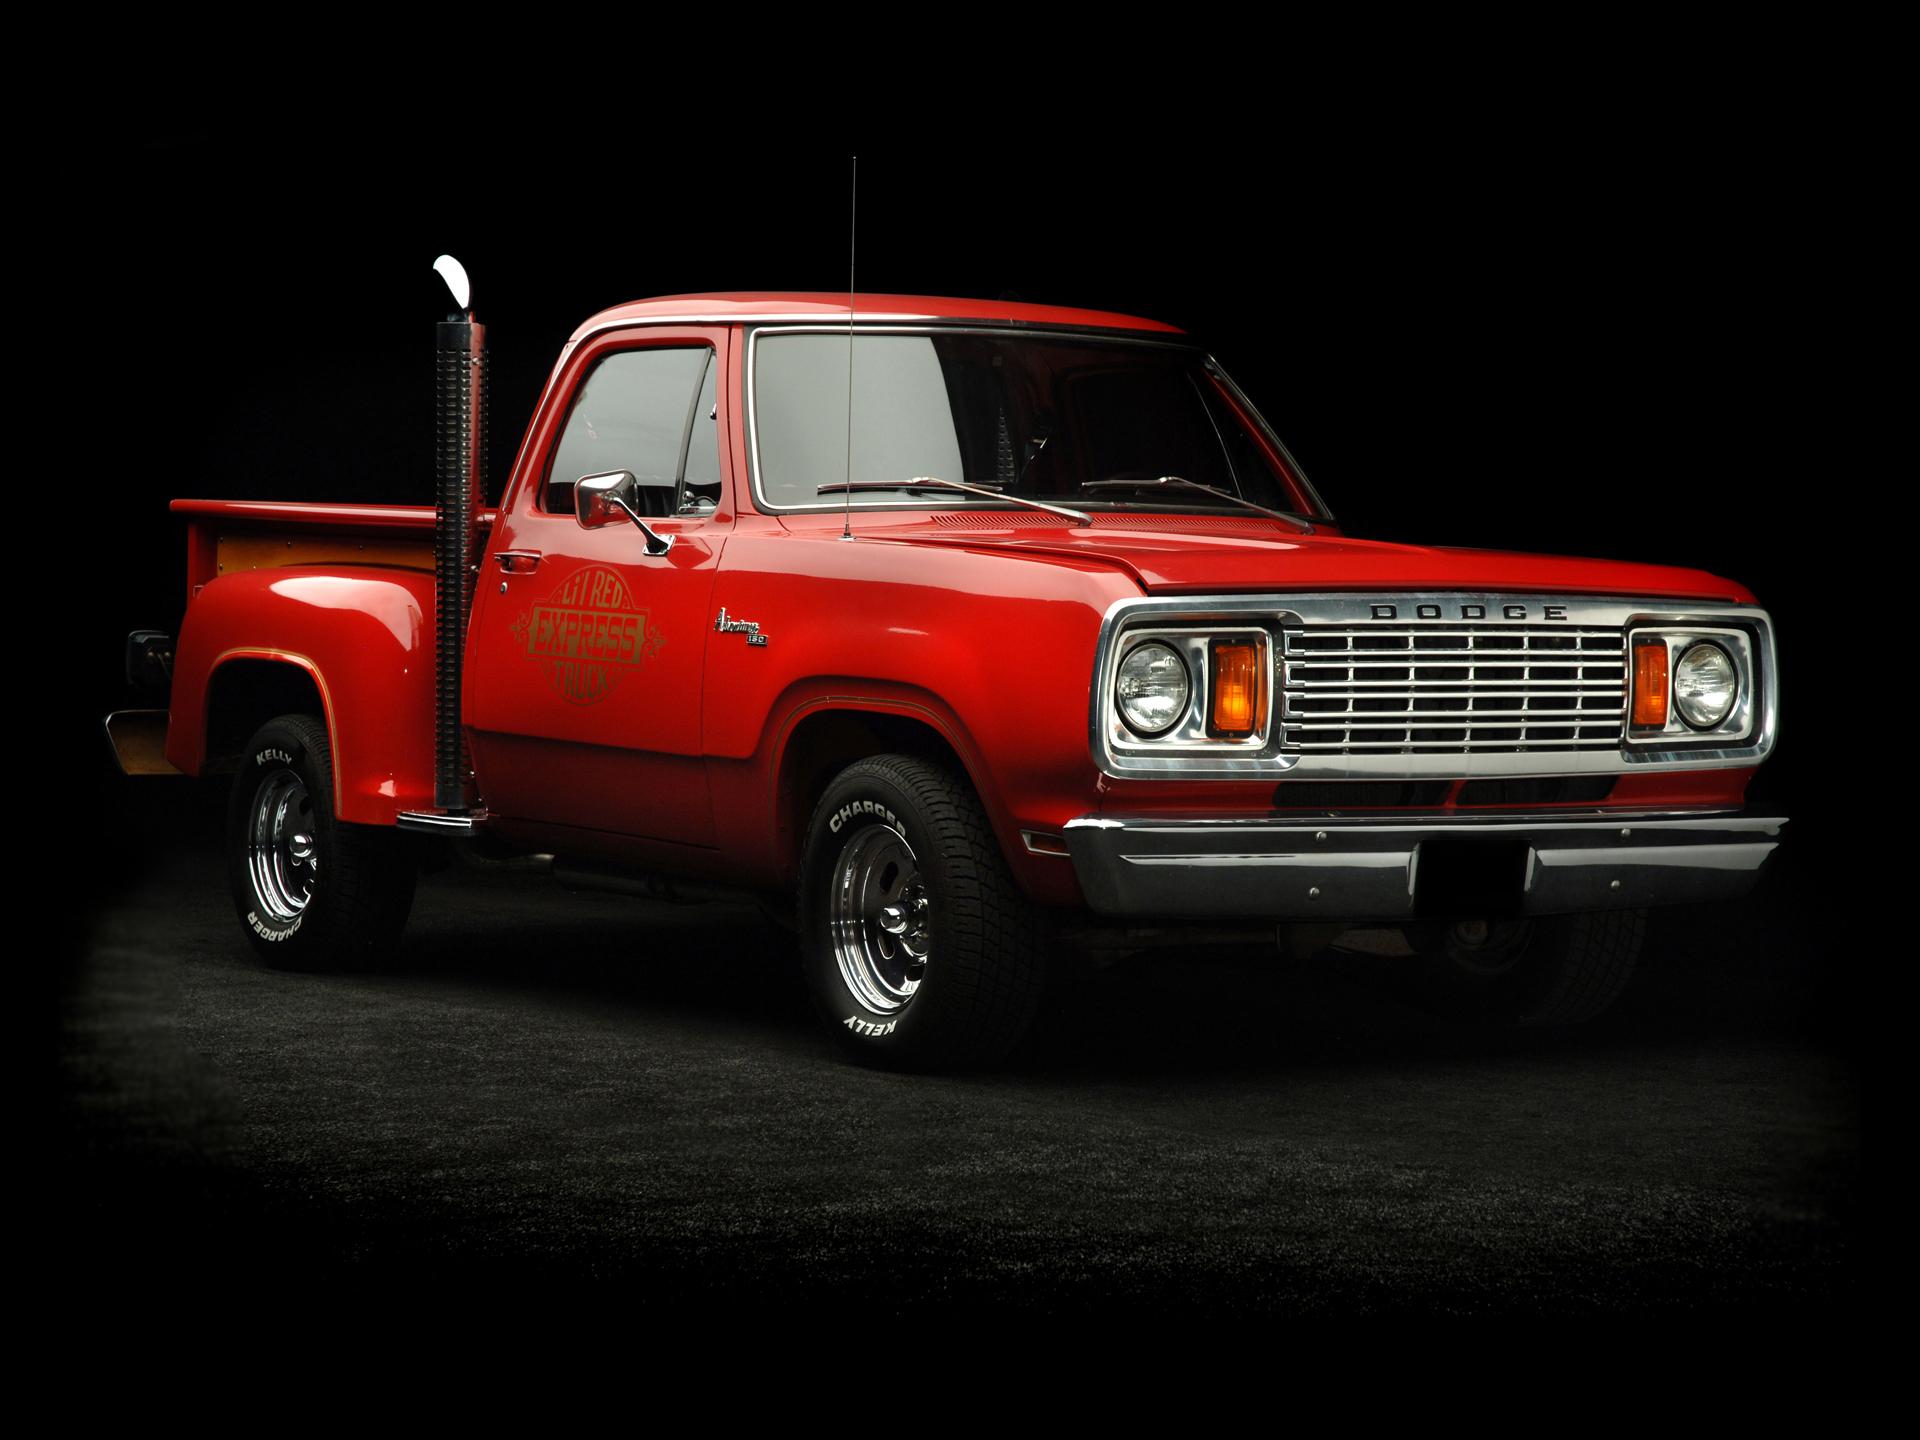 1978 Dodge Adventurer Li L Red Express Truck Pickup Hot